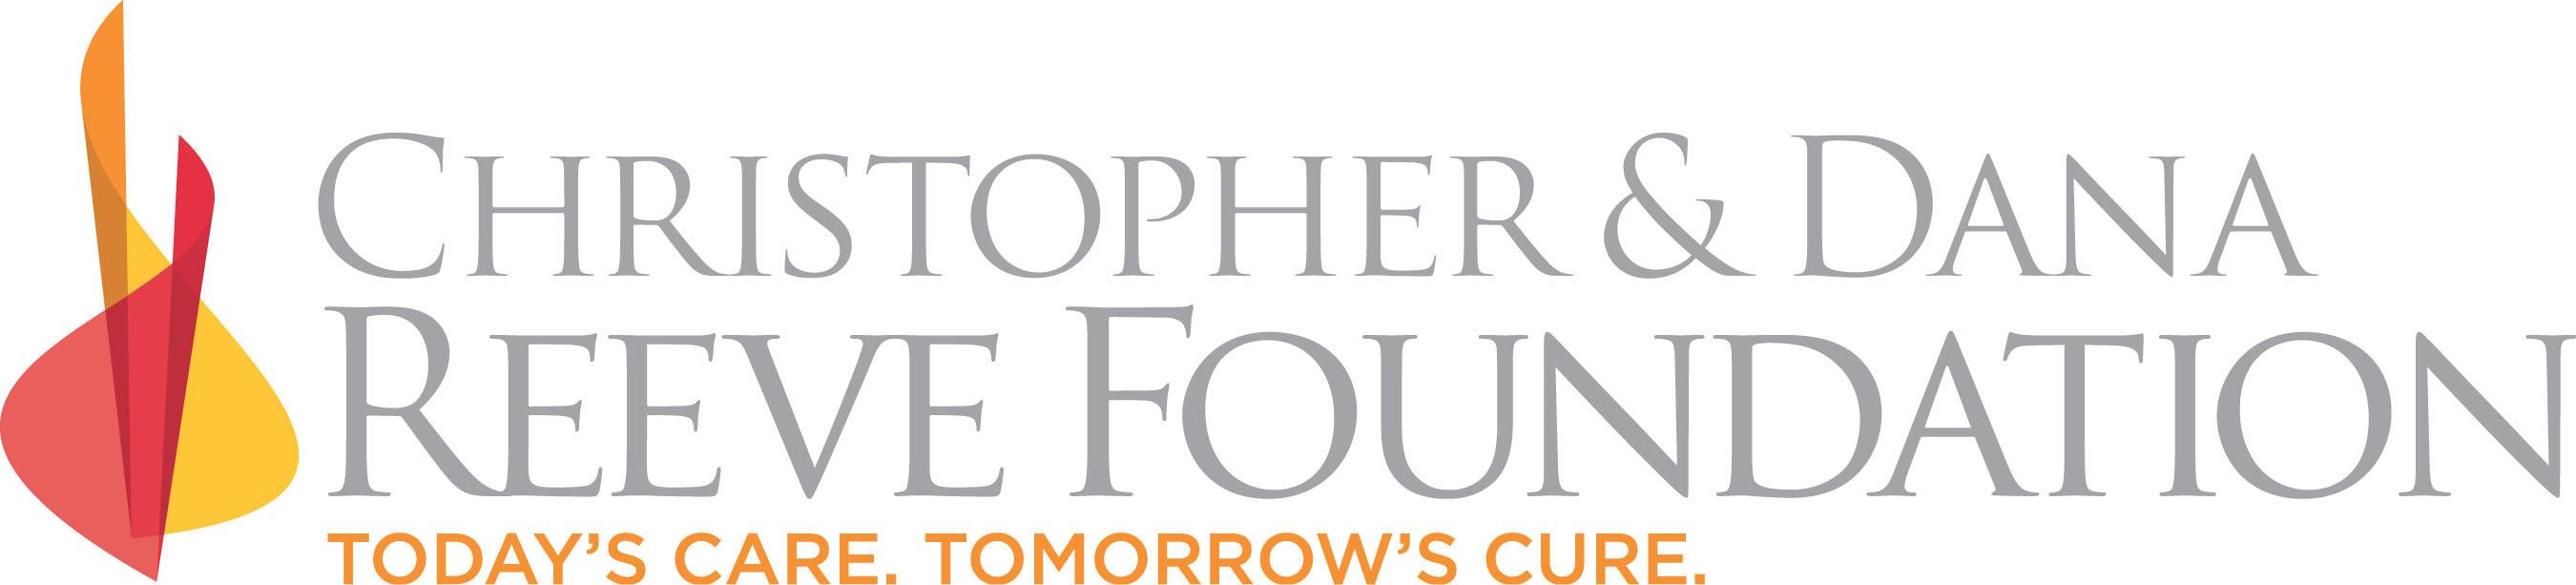 Christopher & Dana Reeve Foundation. (PRNewsFoto/Christopher & Dana Reeve Foundation) (PRNewsFoto/)